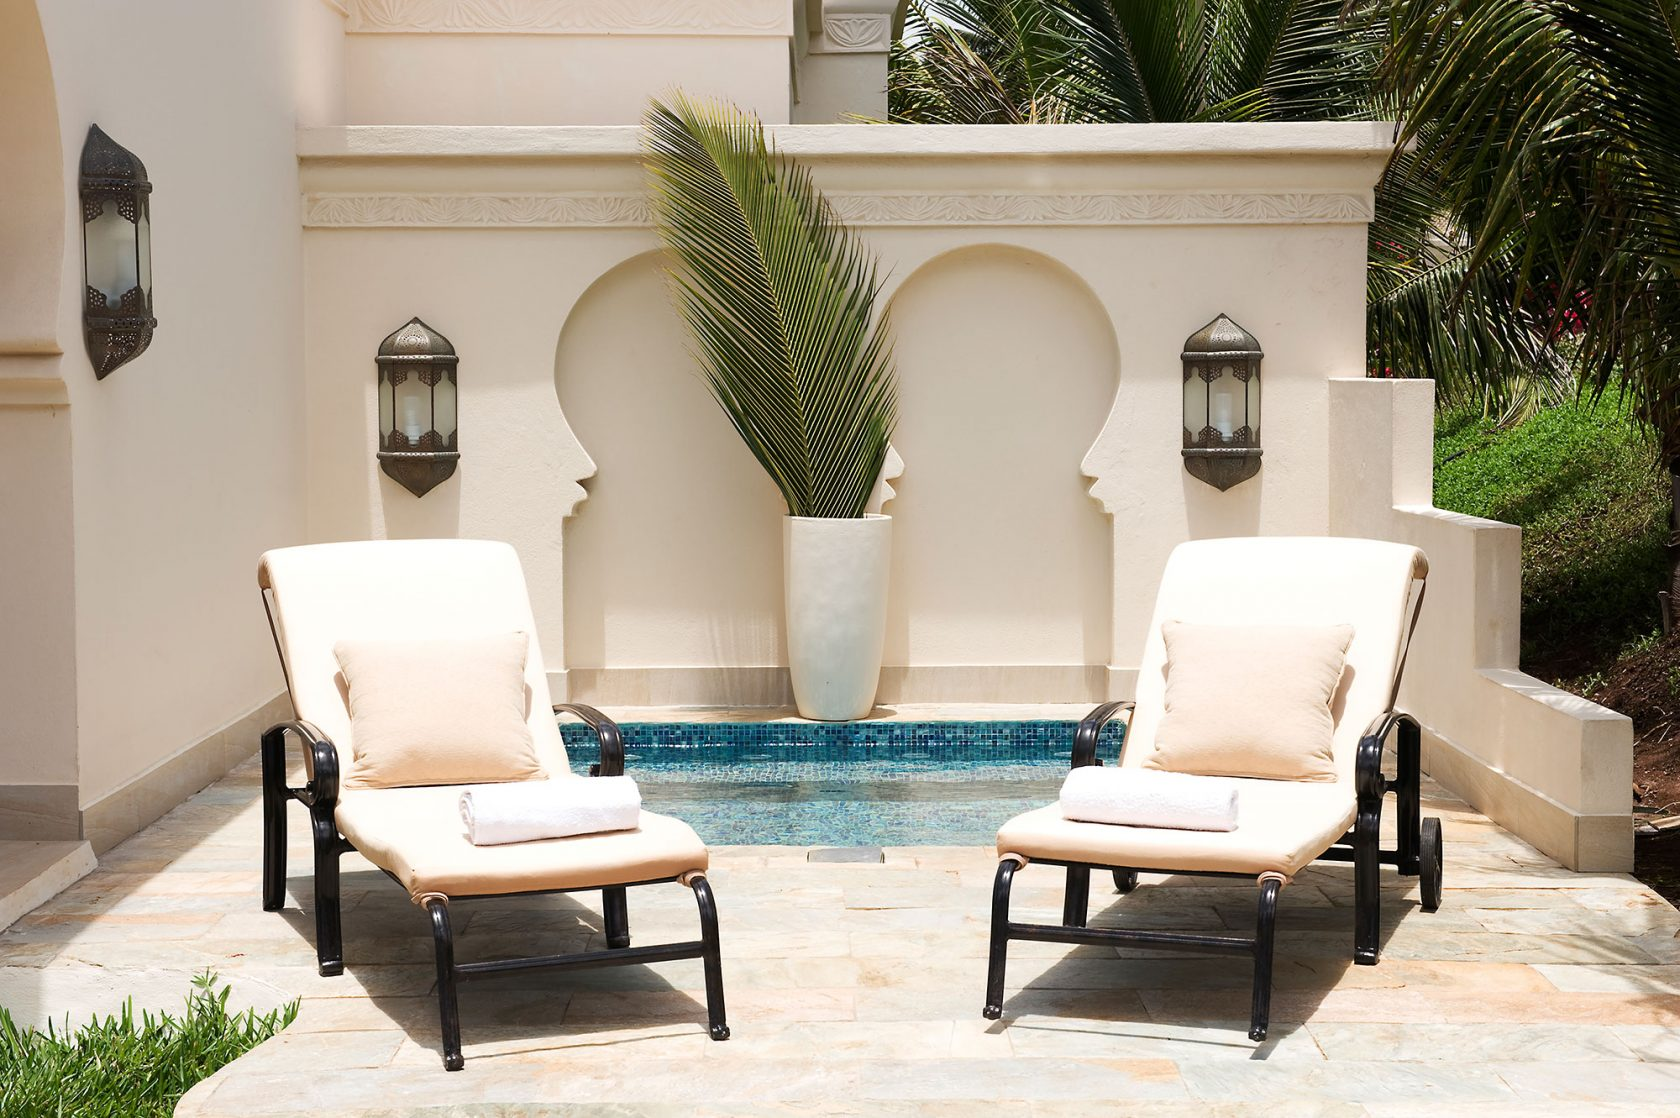 Baraza Resort & Spa Sunbeds at private Pool